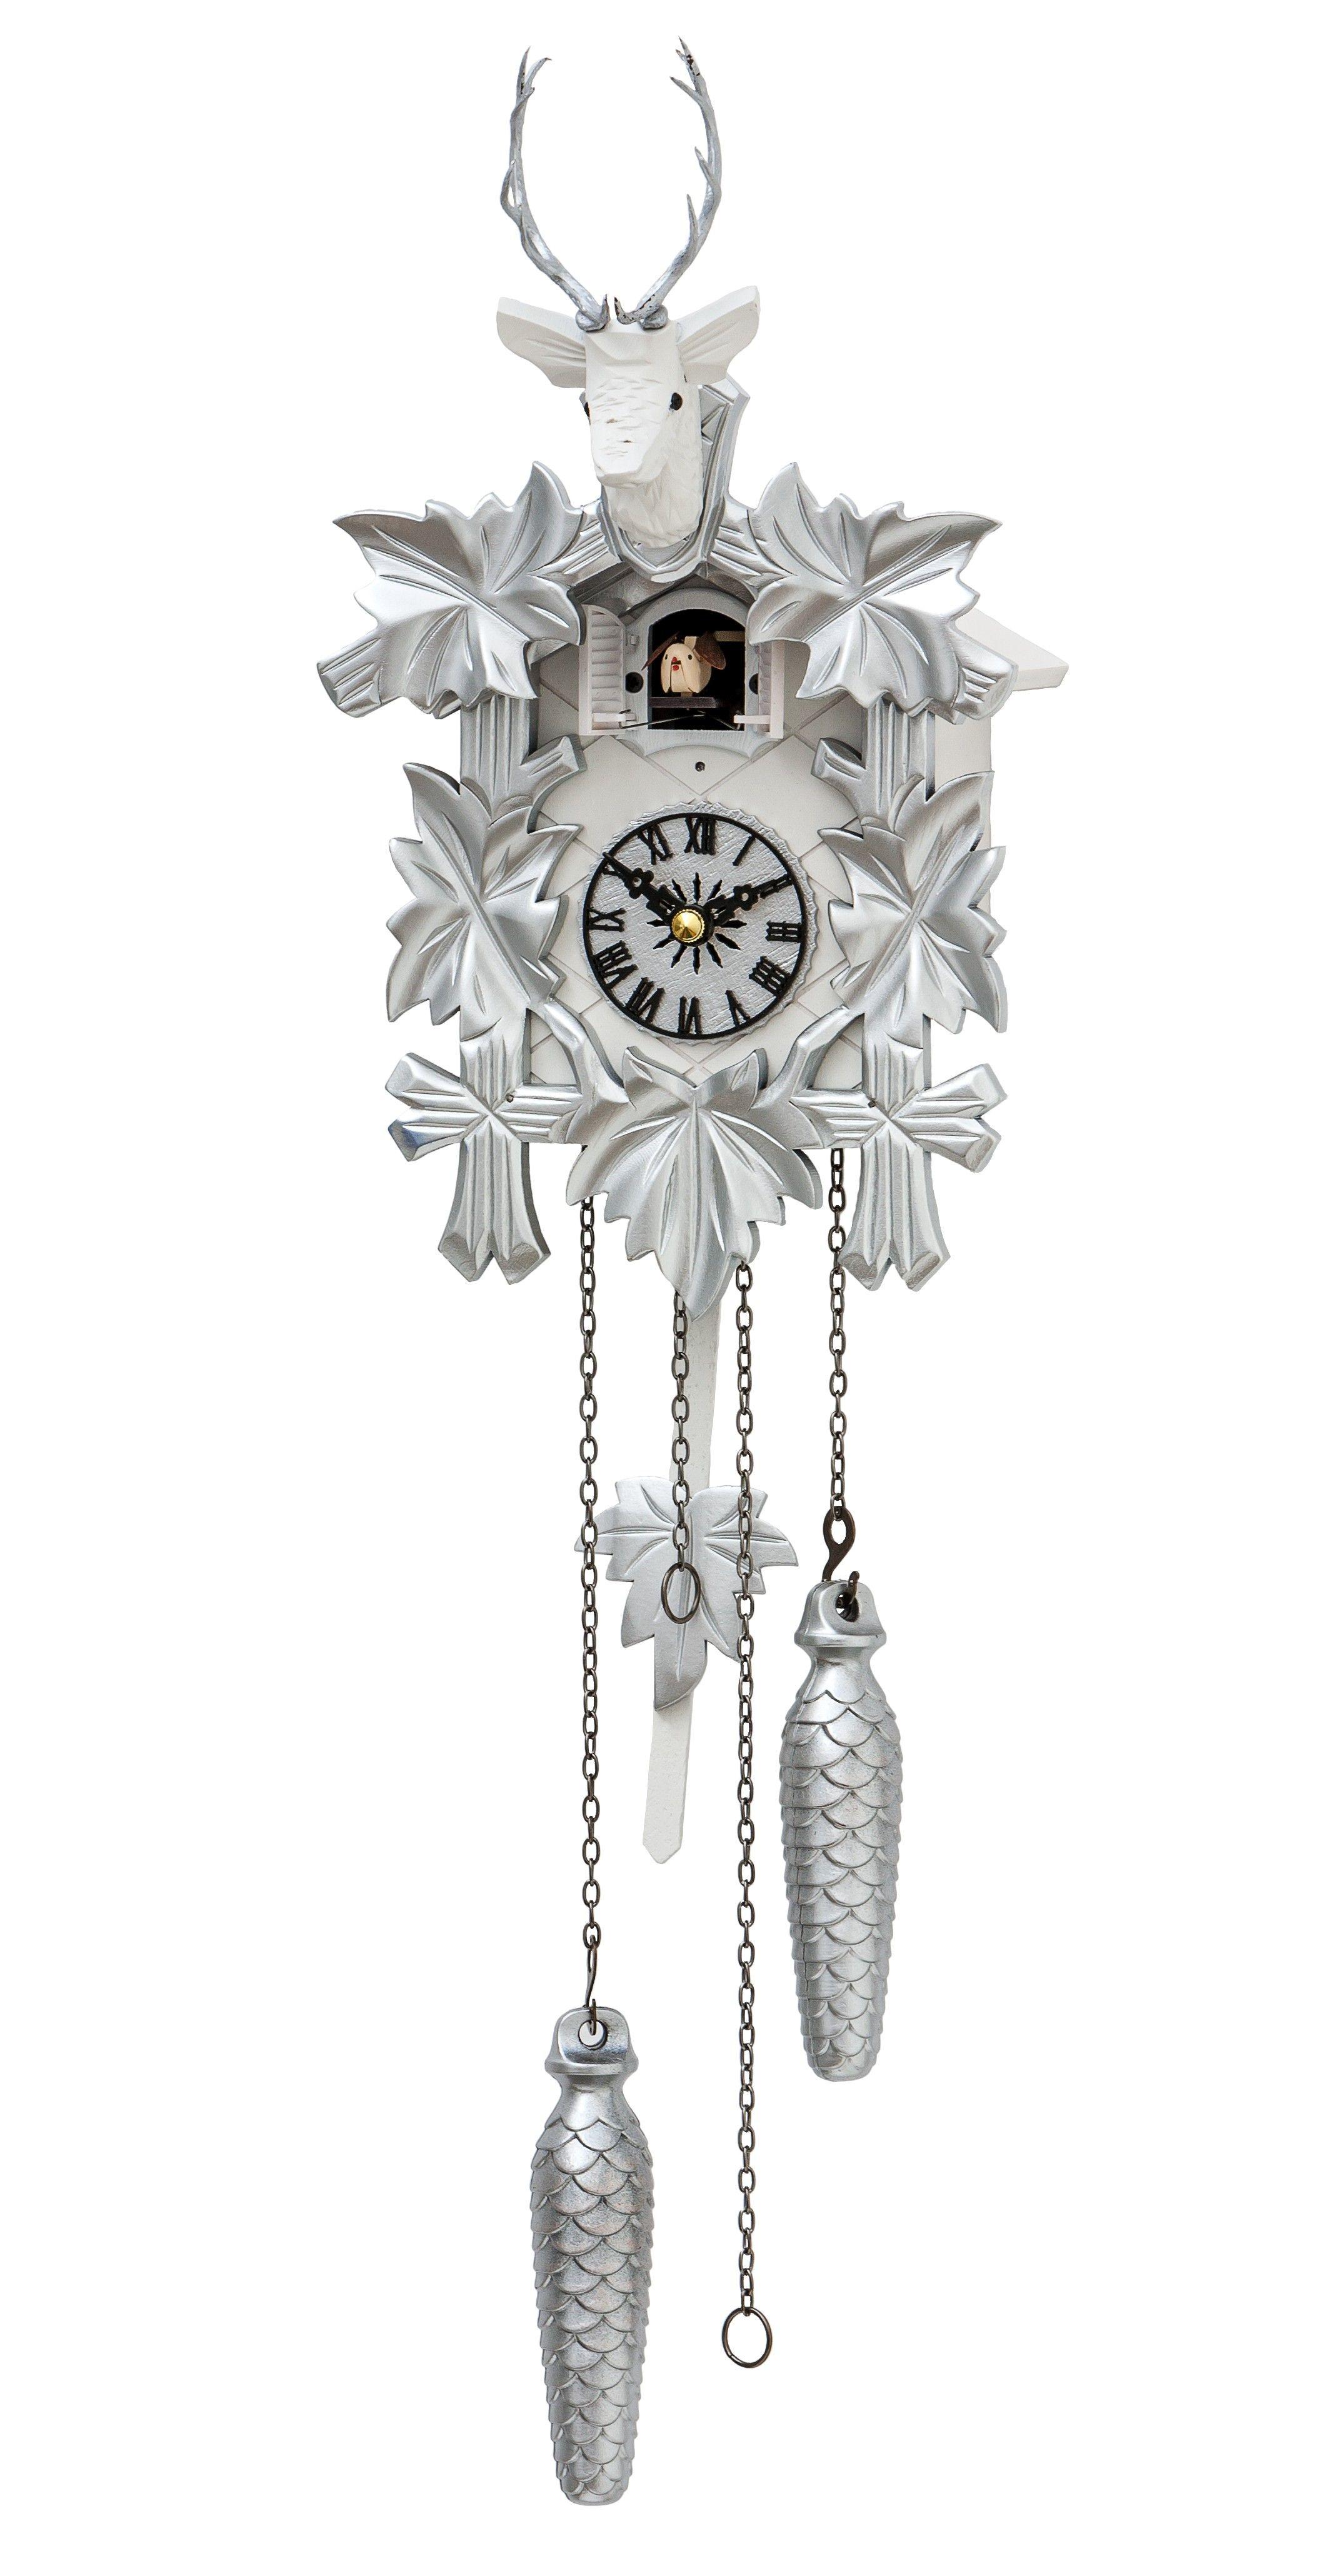 Modern Cuckoo Clock 1 Day Running Time En 522 5 20